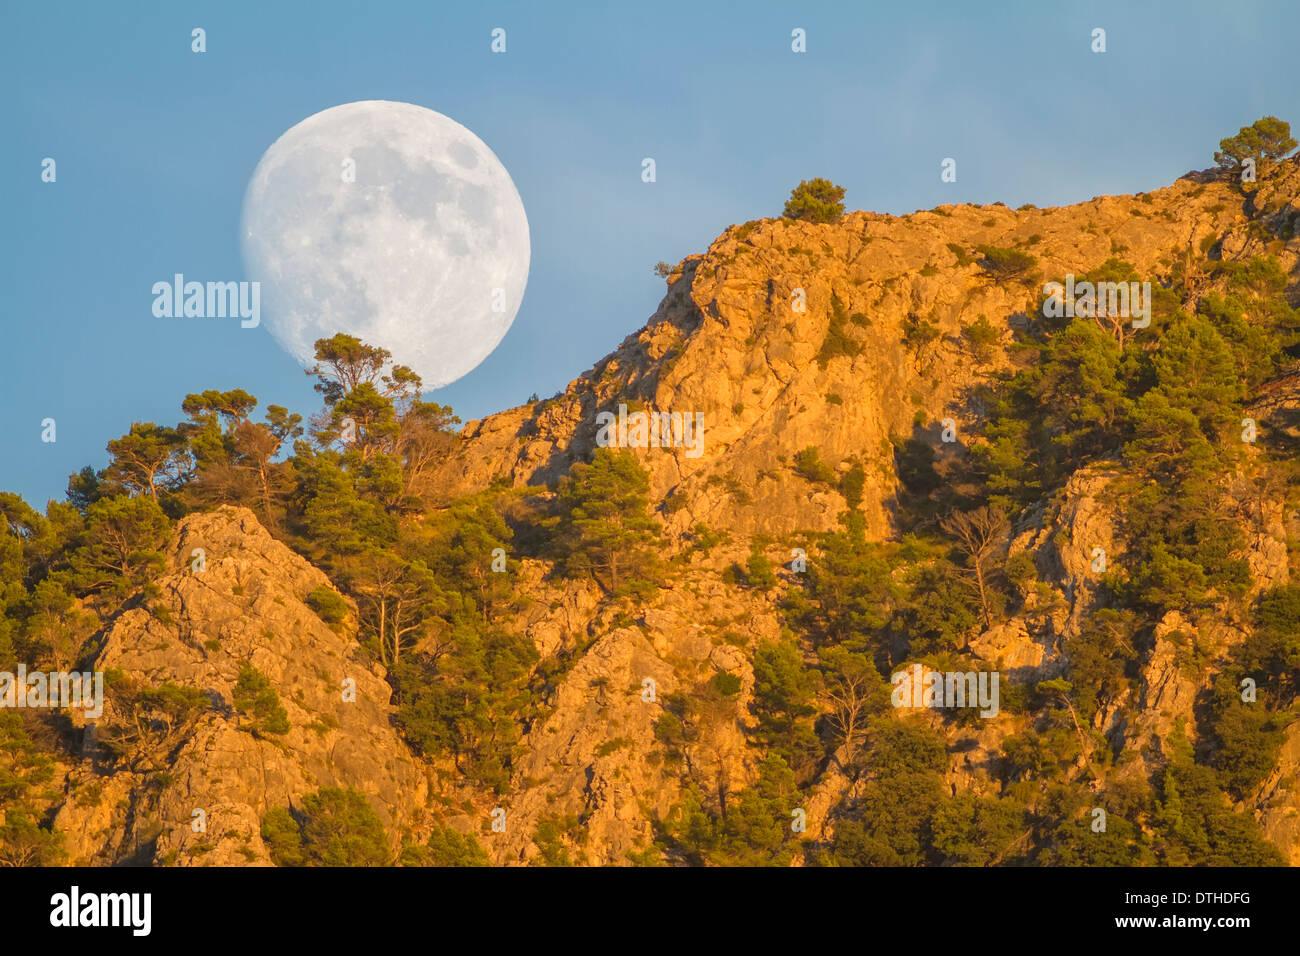 Real full moon rising over Puig des Teix mountain at sunset. Tramuntana mountains, Deià, Majorca, Balearic islands, Spain Stock Photo